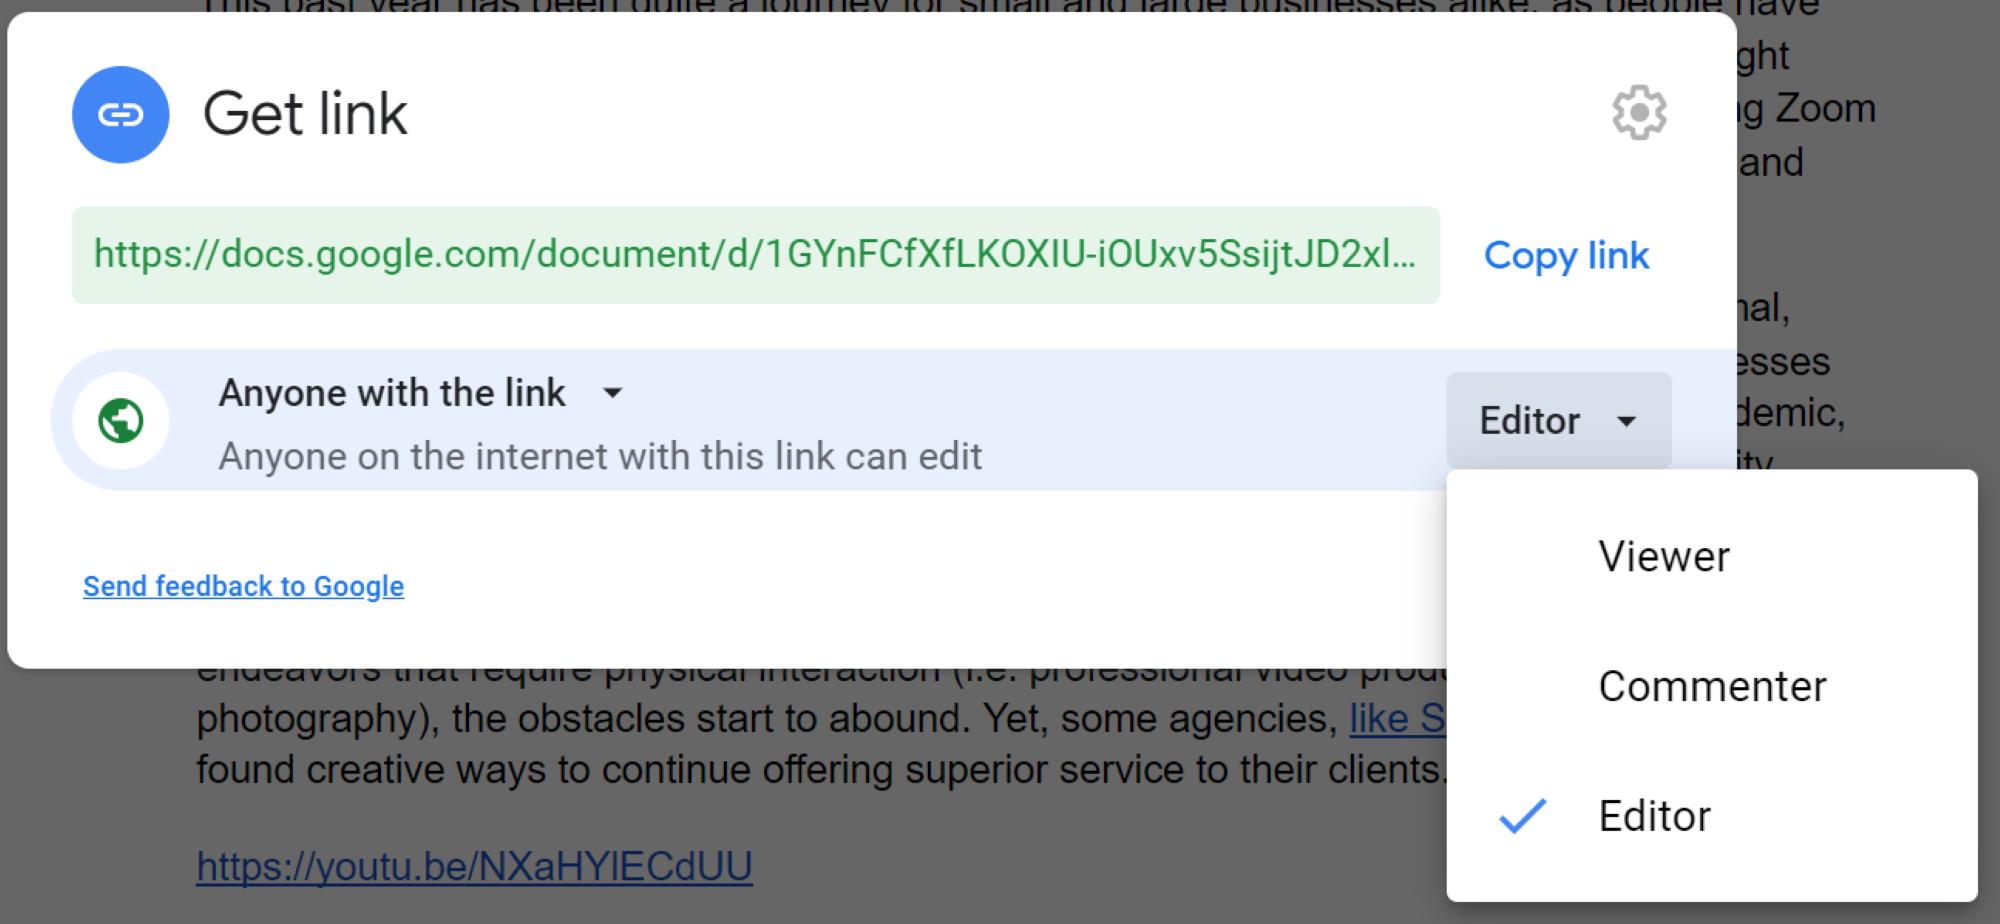 Google doc sharing permissions